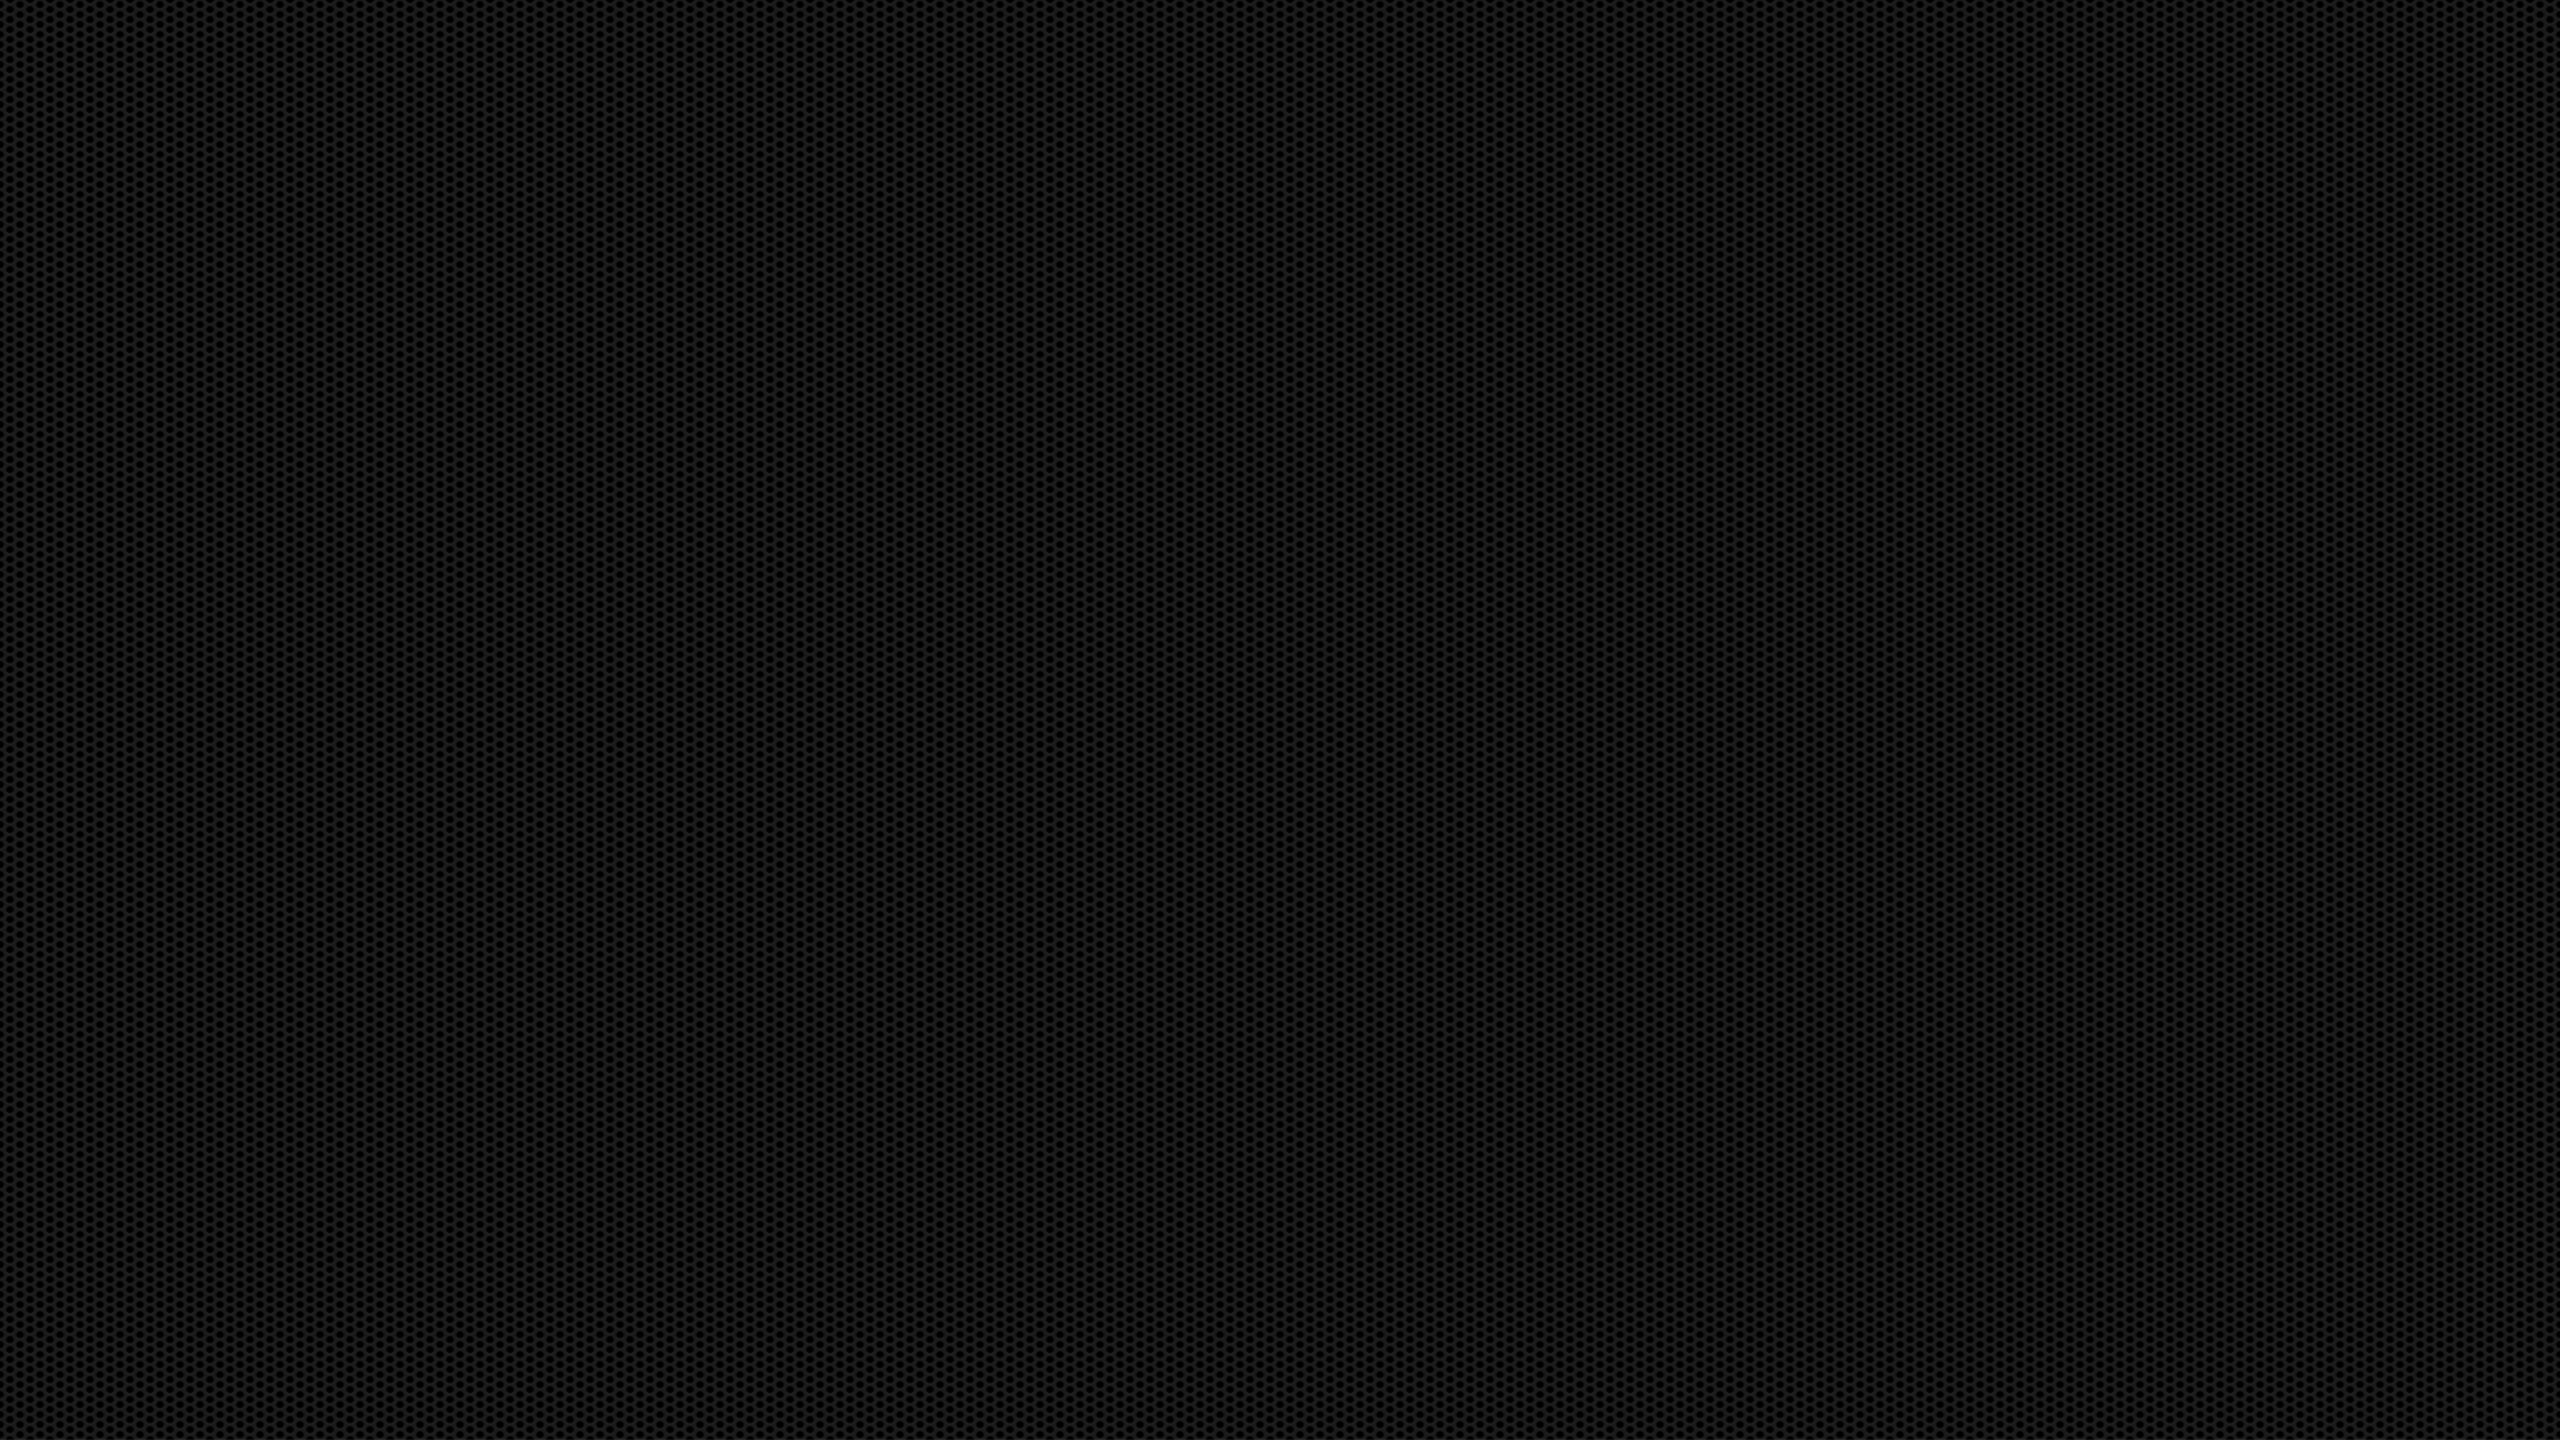 black honeycomb mesh by monkeymagico customization wallpaper 2560x1440